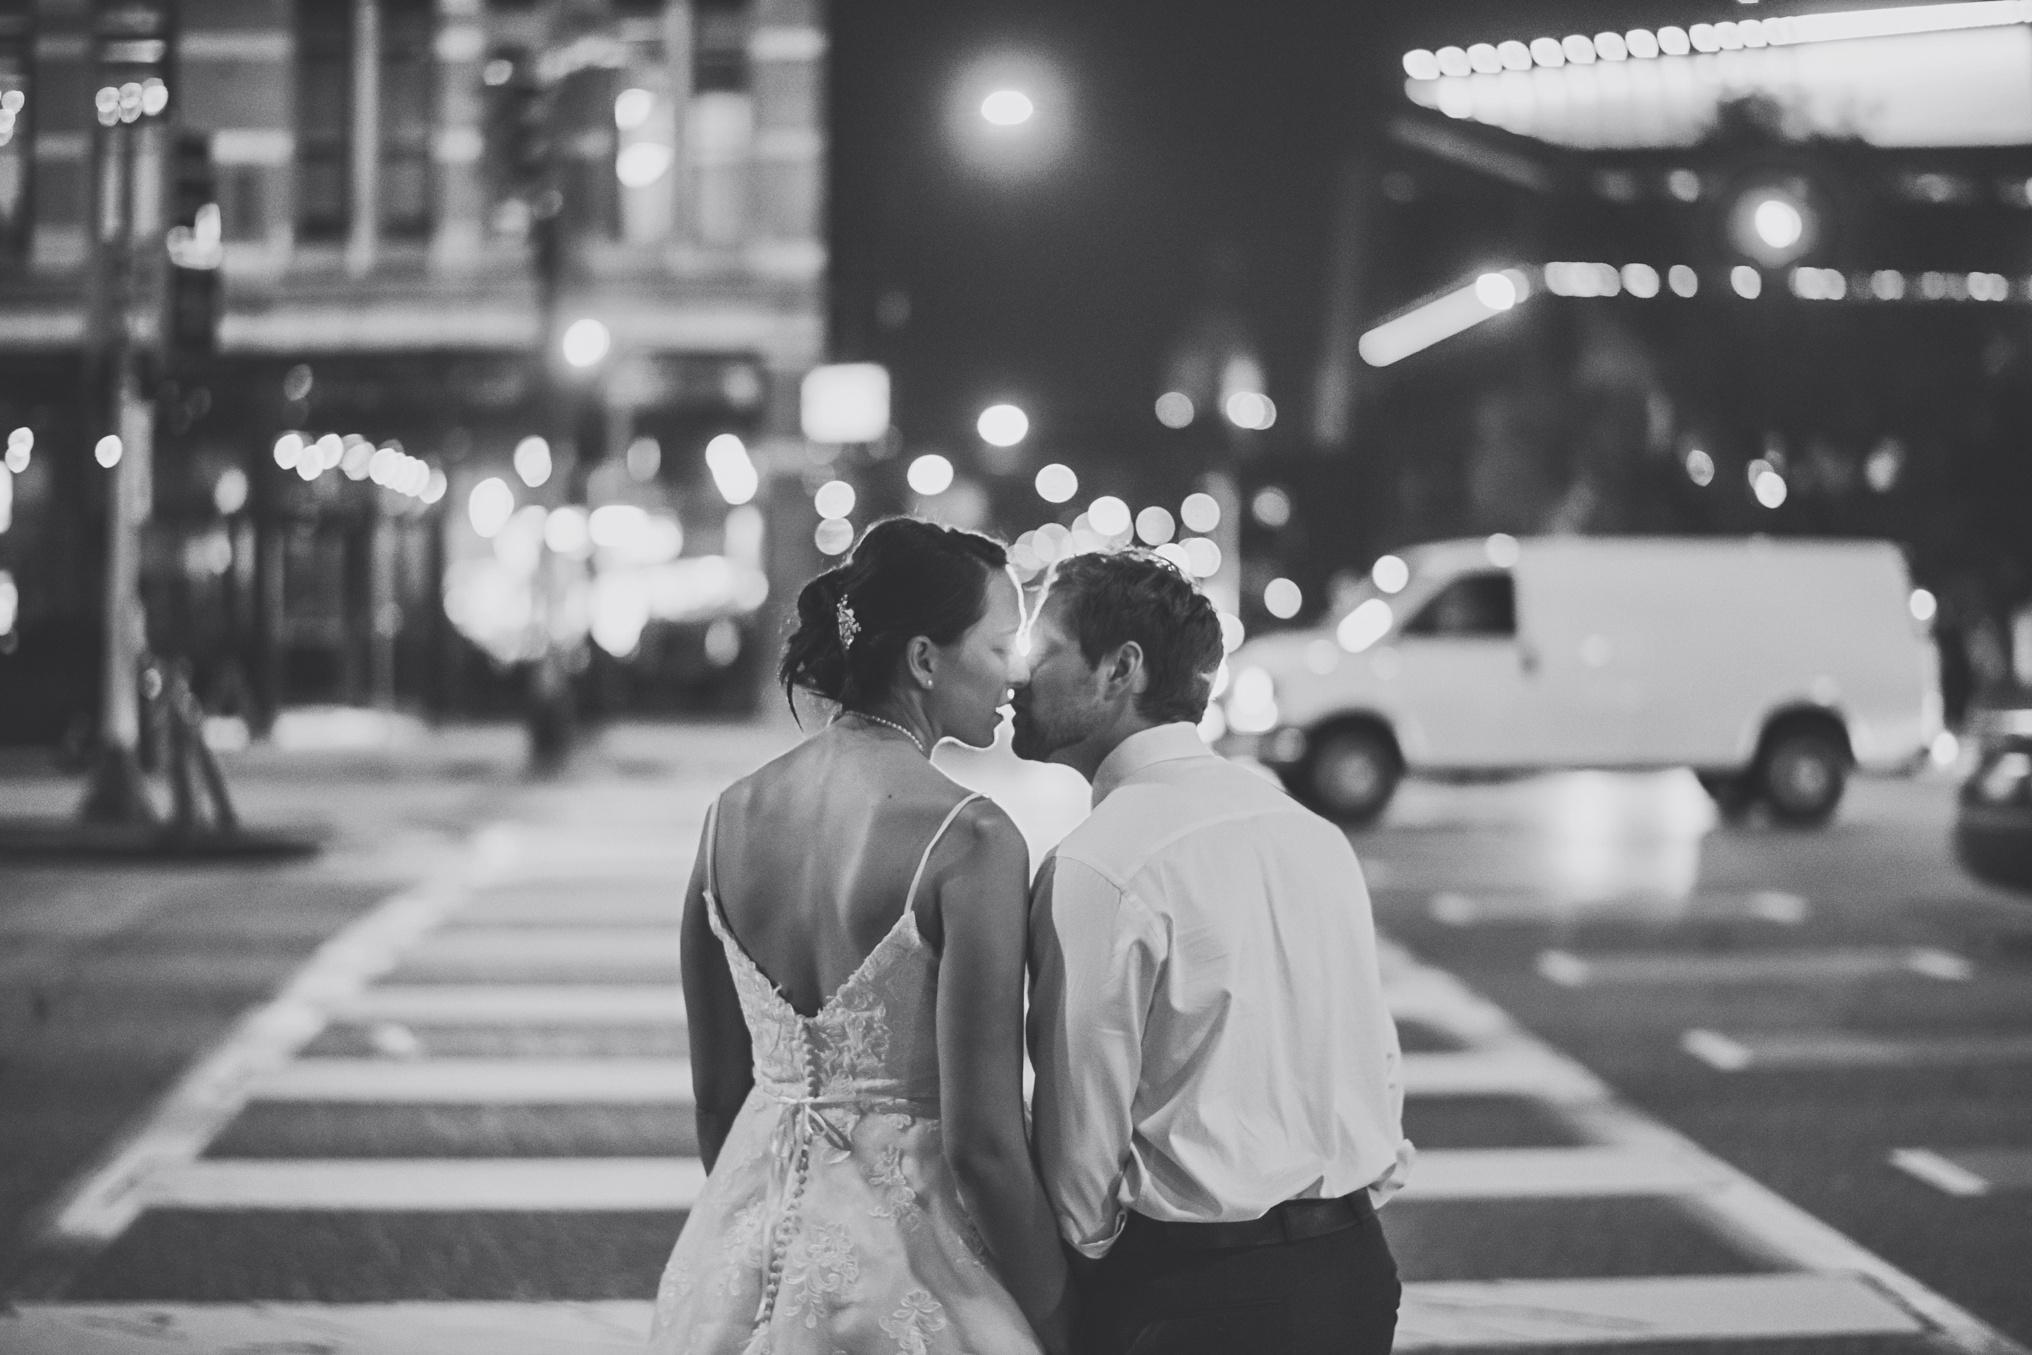 best_wedding_photography_2017_by_lucas_botz_photography_015.jpg